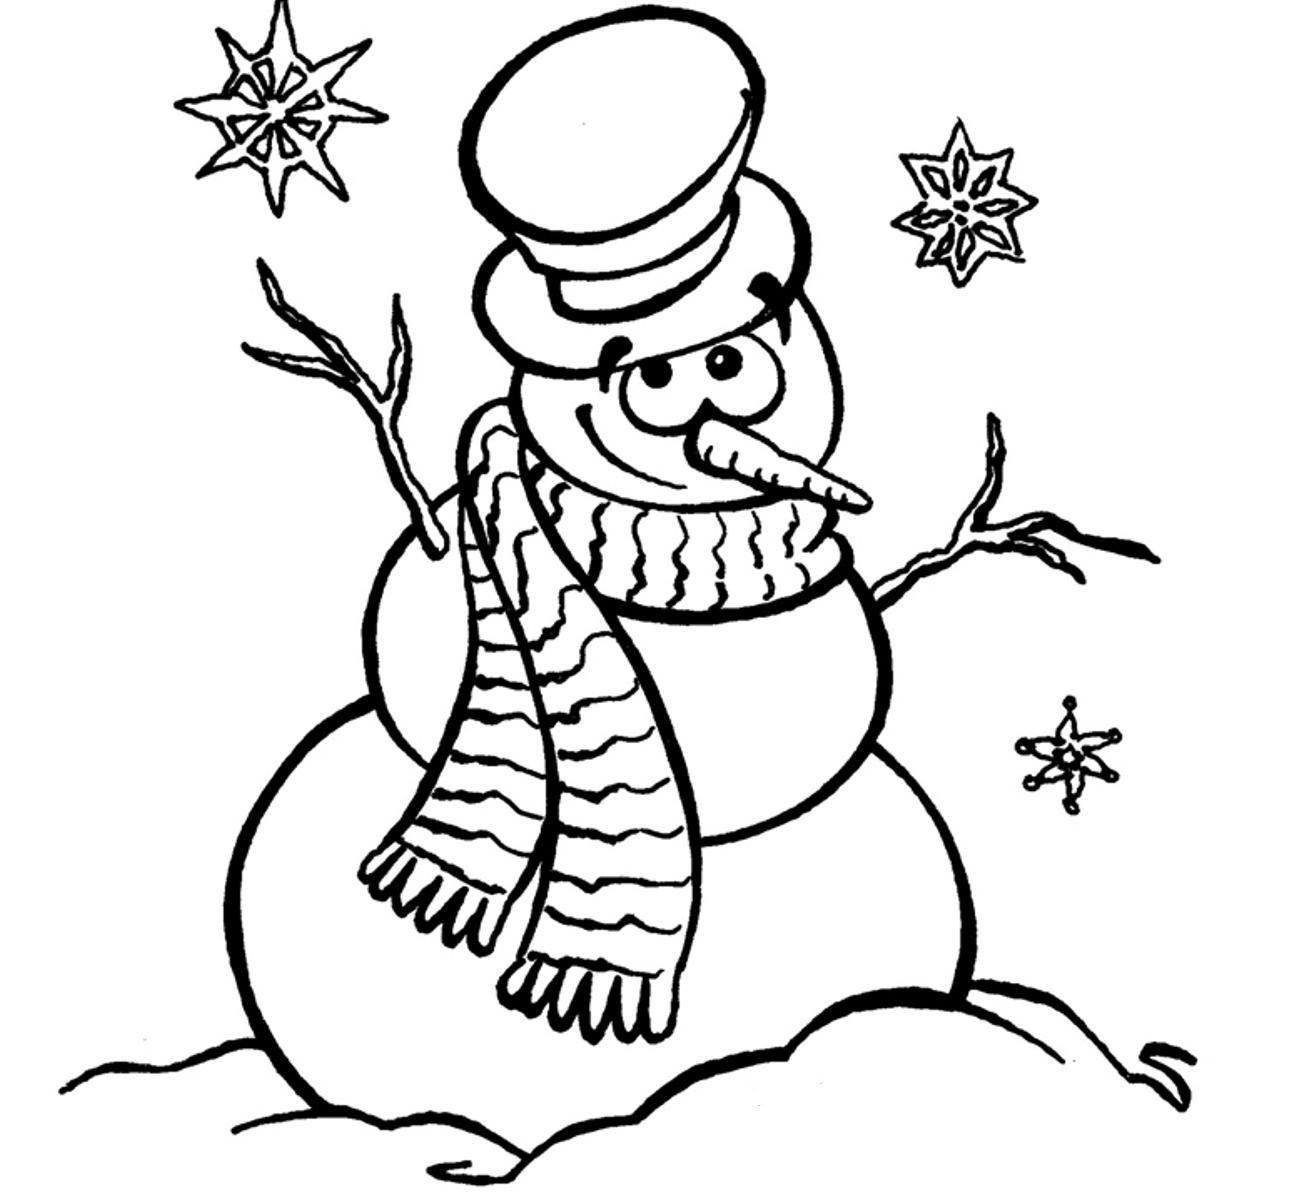 Snowman Line Drawing At Getdrawings